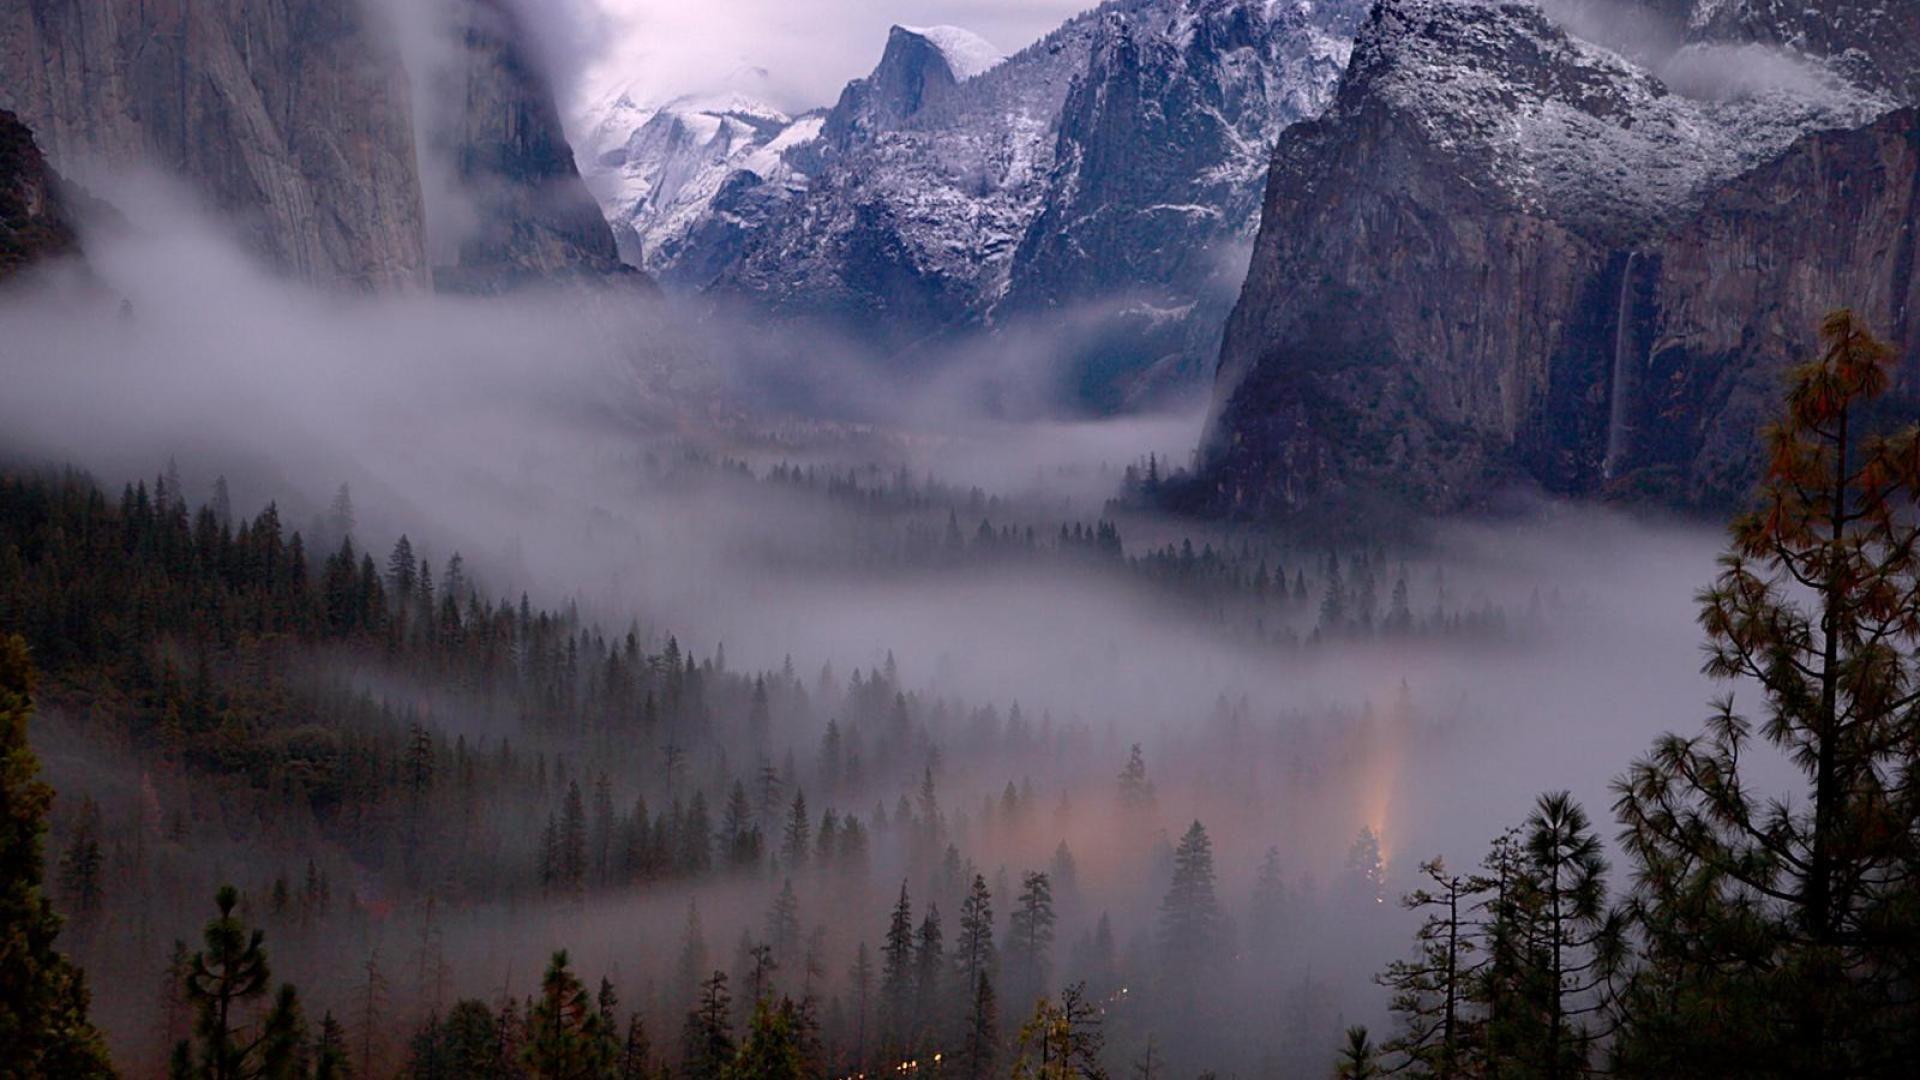 Yosemite Wallpaper Night Wallpaper Hd Yosemite Valley